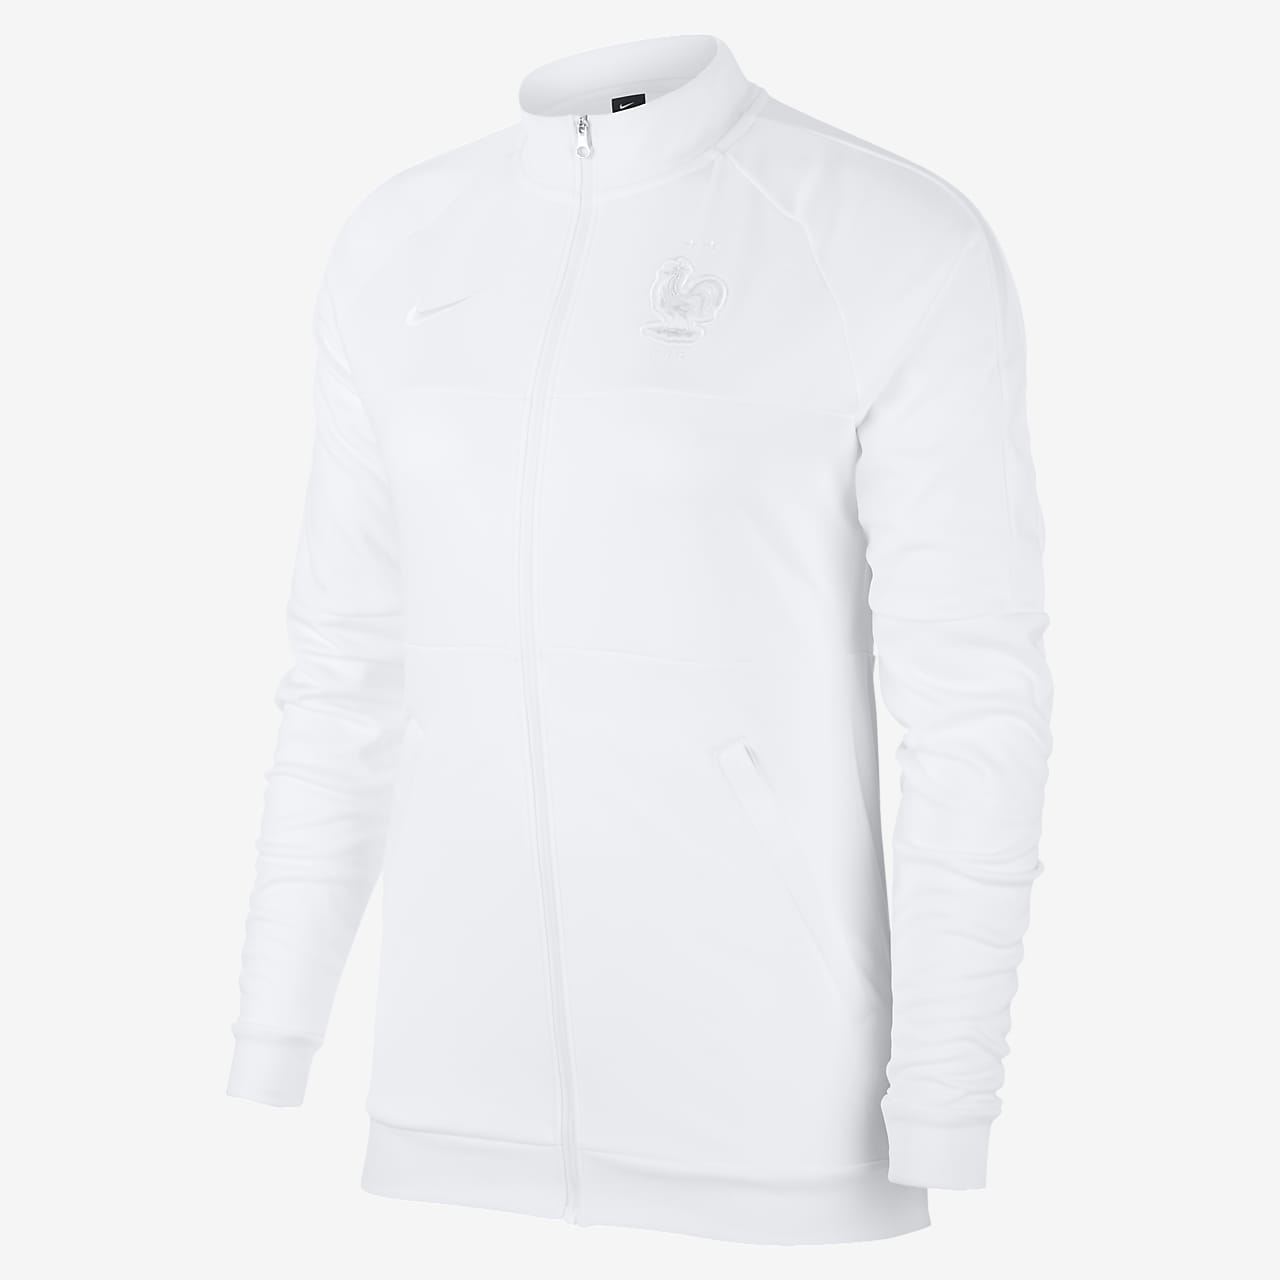 Track jacket da calcio FFF - Donna